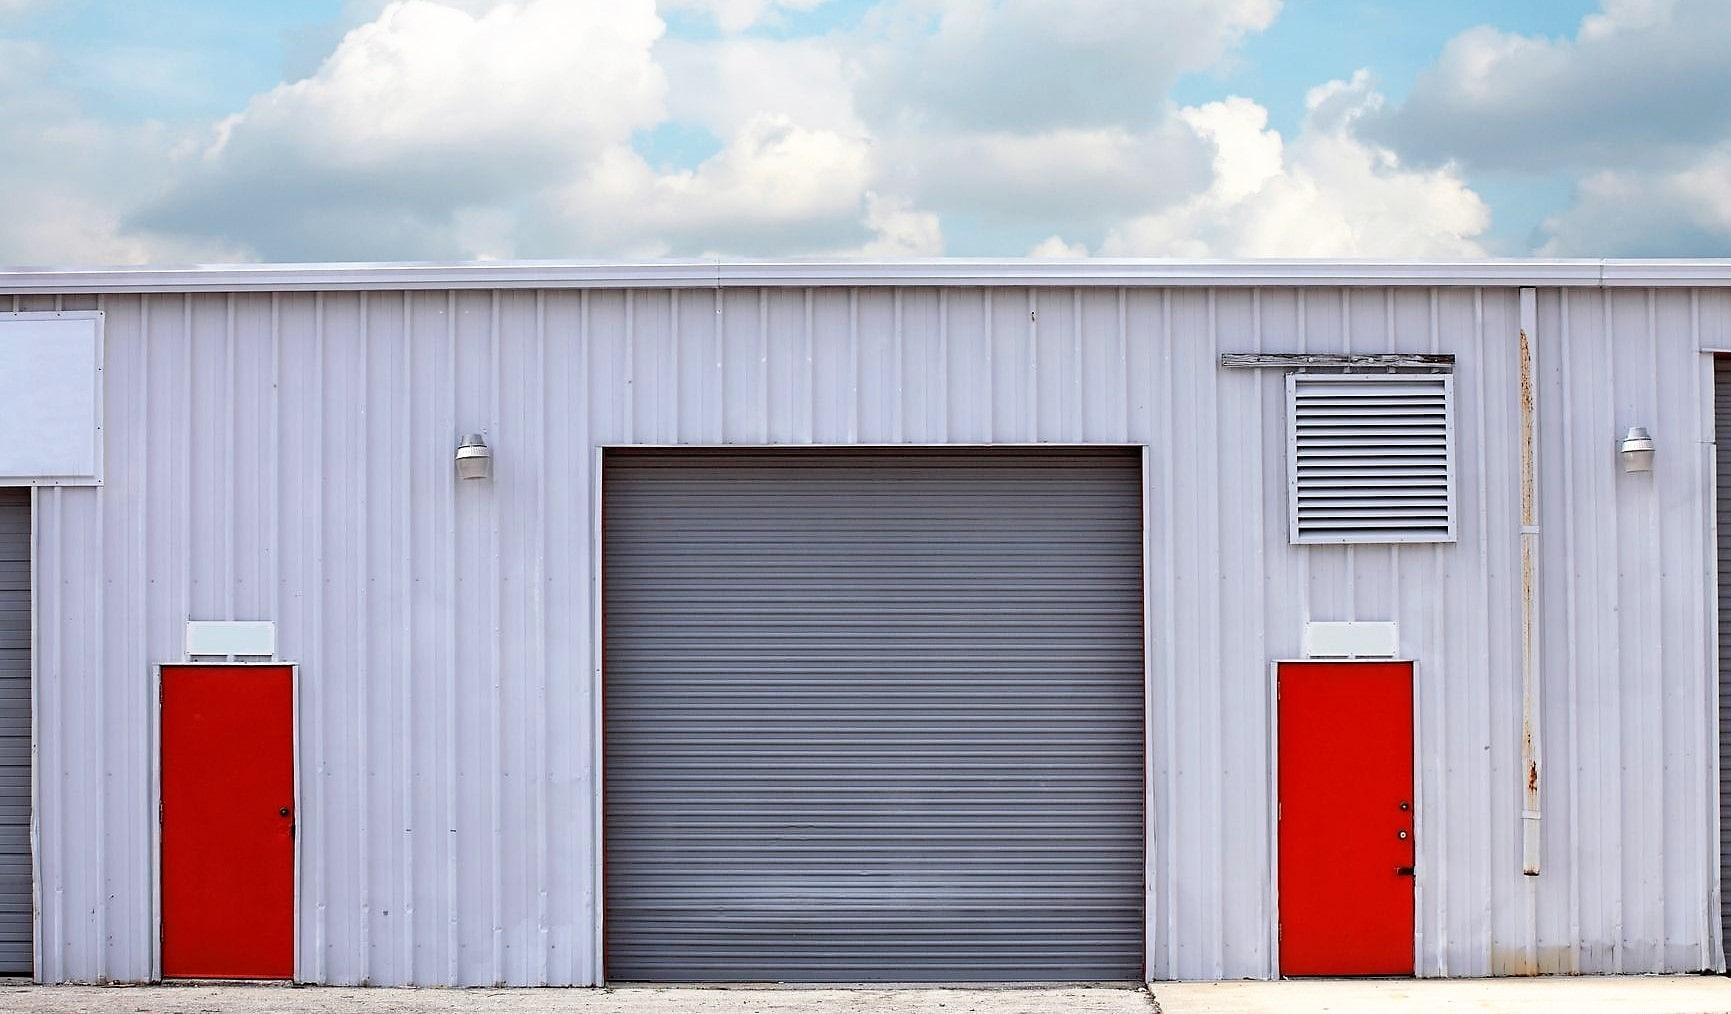 industrial warehouse with red pedestrian doors